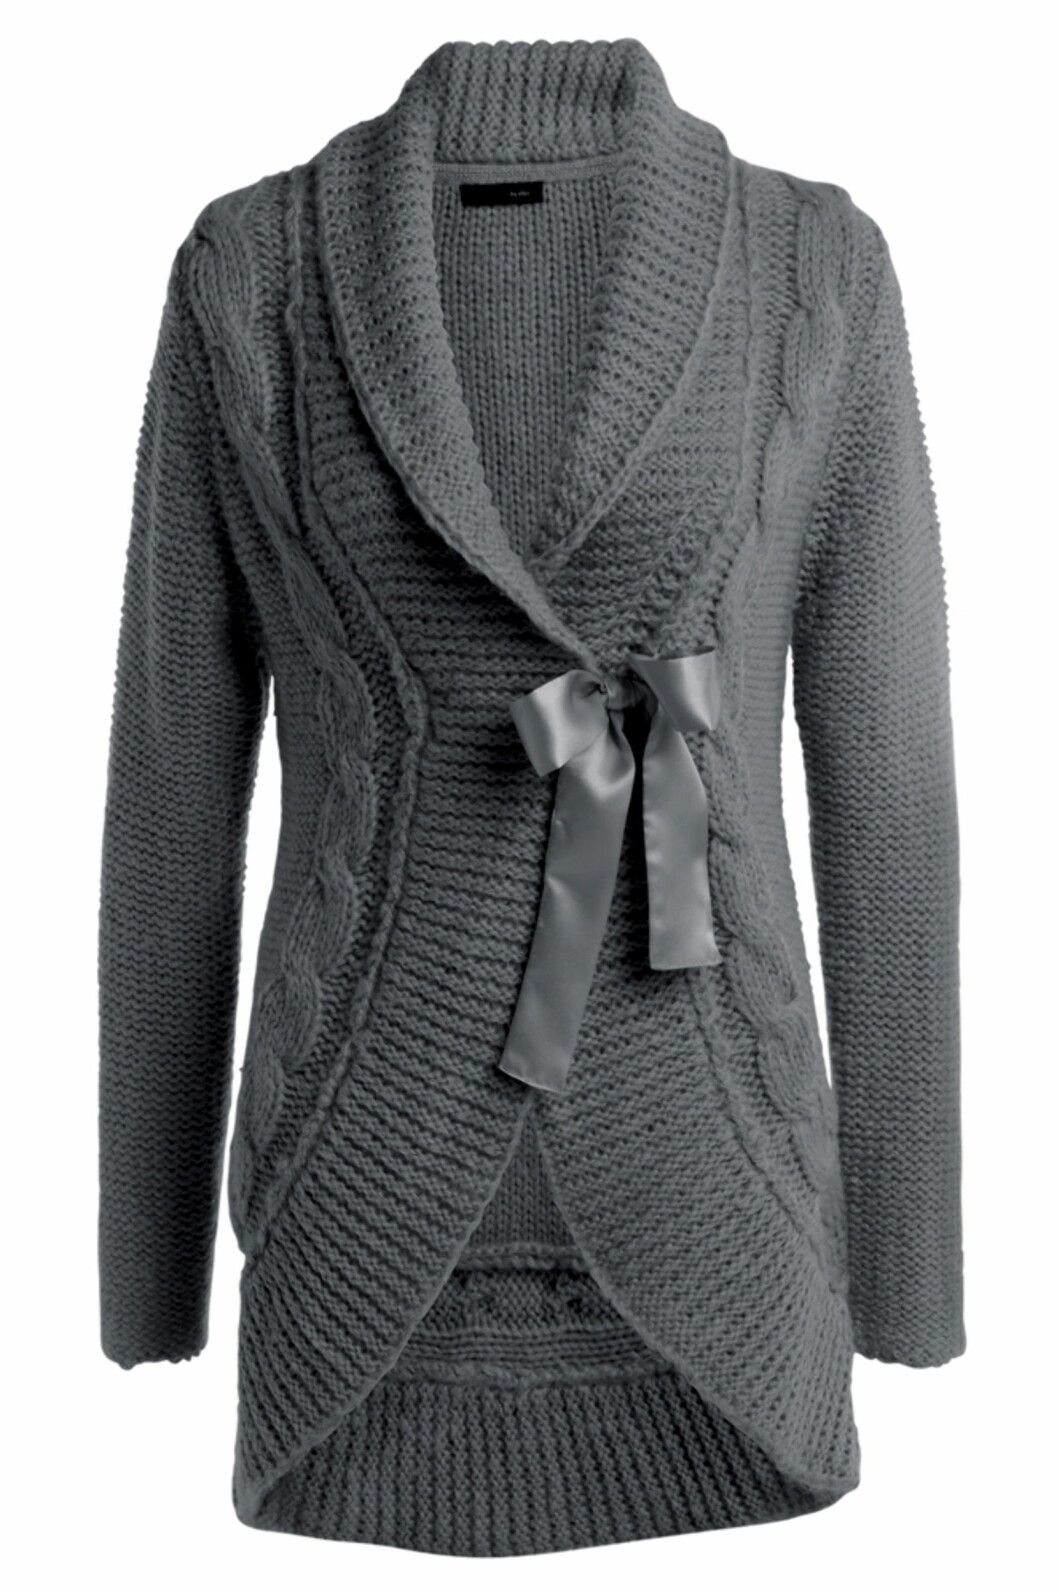 Lang, strikket akrylcardigan med sløyfelukking (kr 399, Ellos).